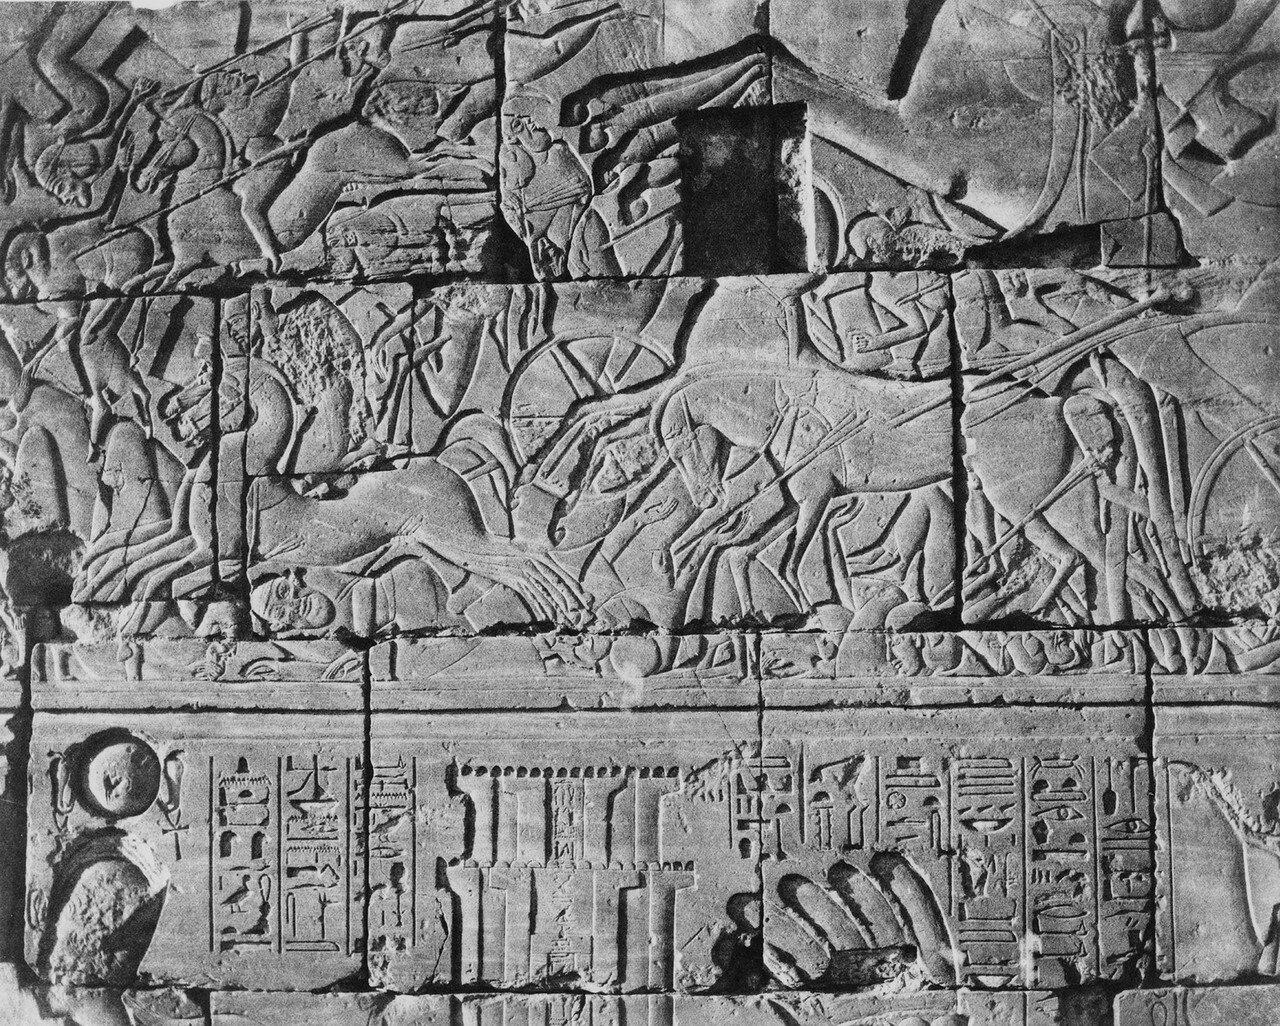 Карнак (Фивы).Роспись на стене храма. 1858